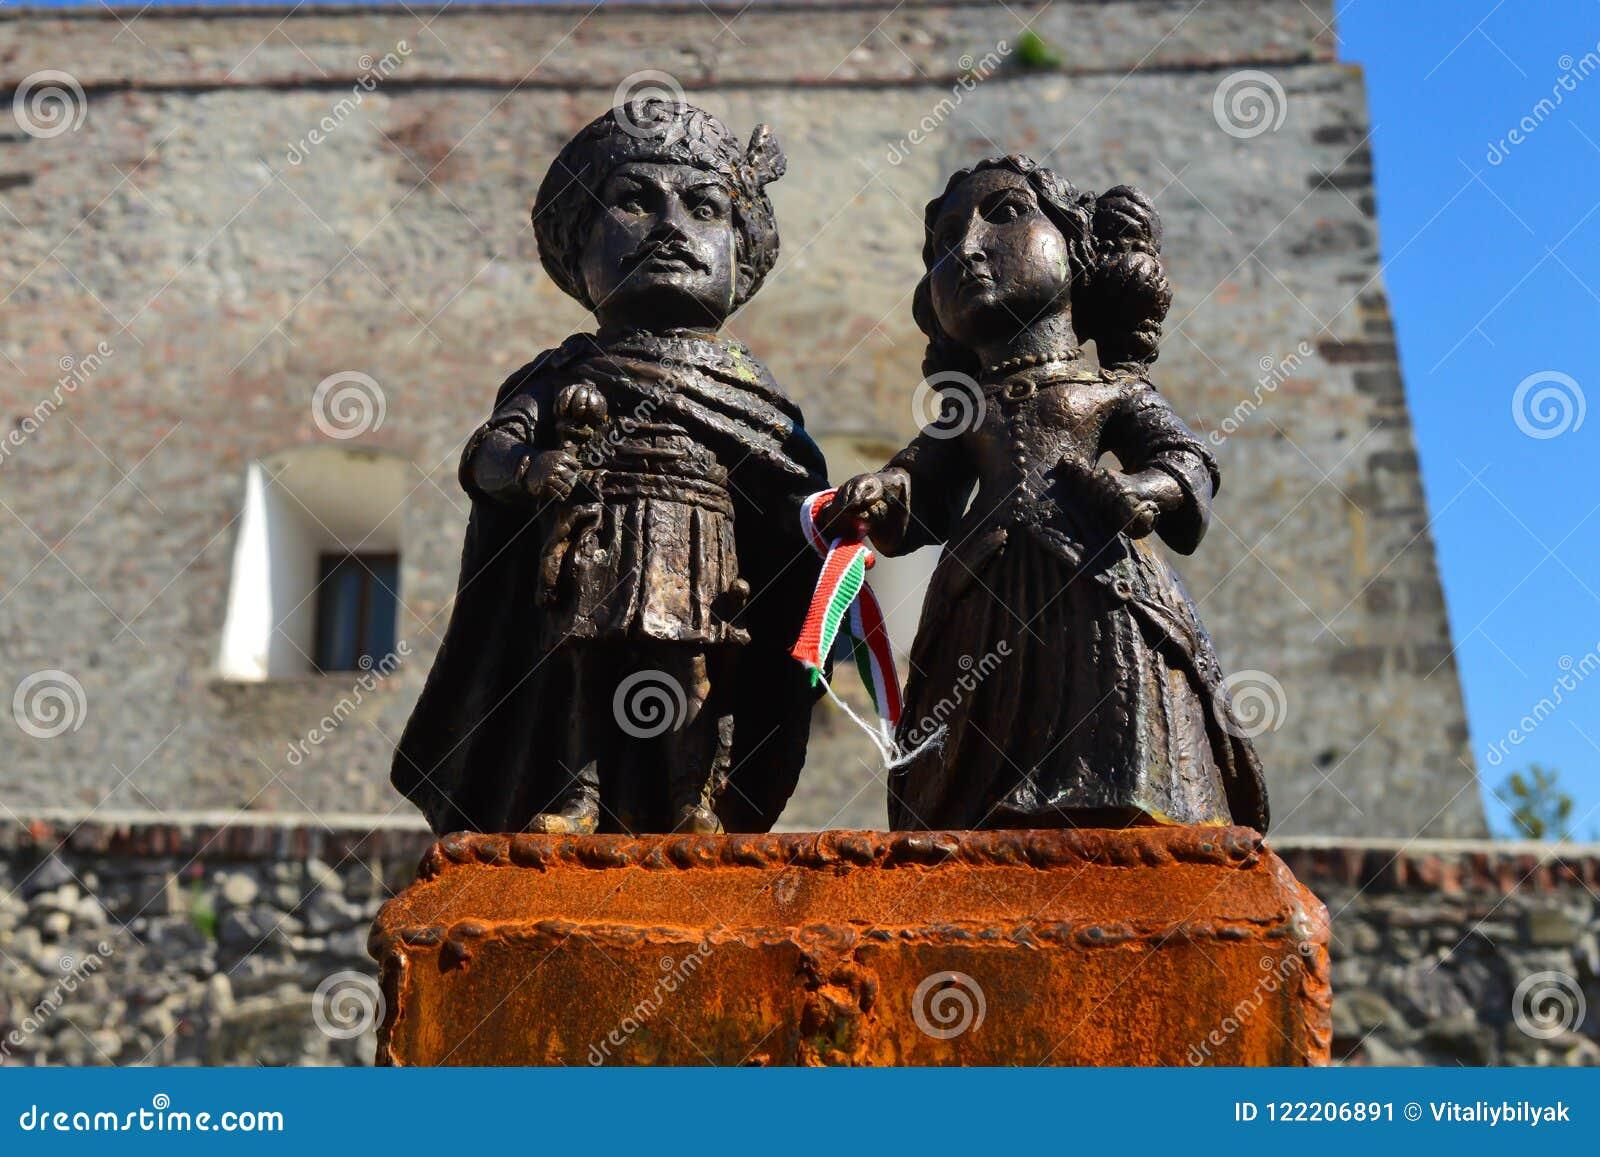 Mini-statue of Countess Ilona Zrini and Count Imre Tekeli in castle Palanok - Mukachevo, Ukraine o